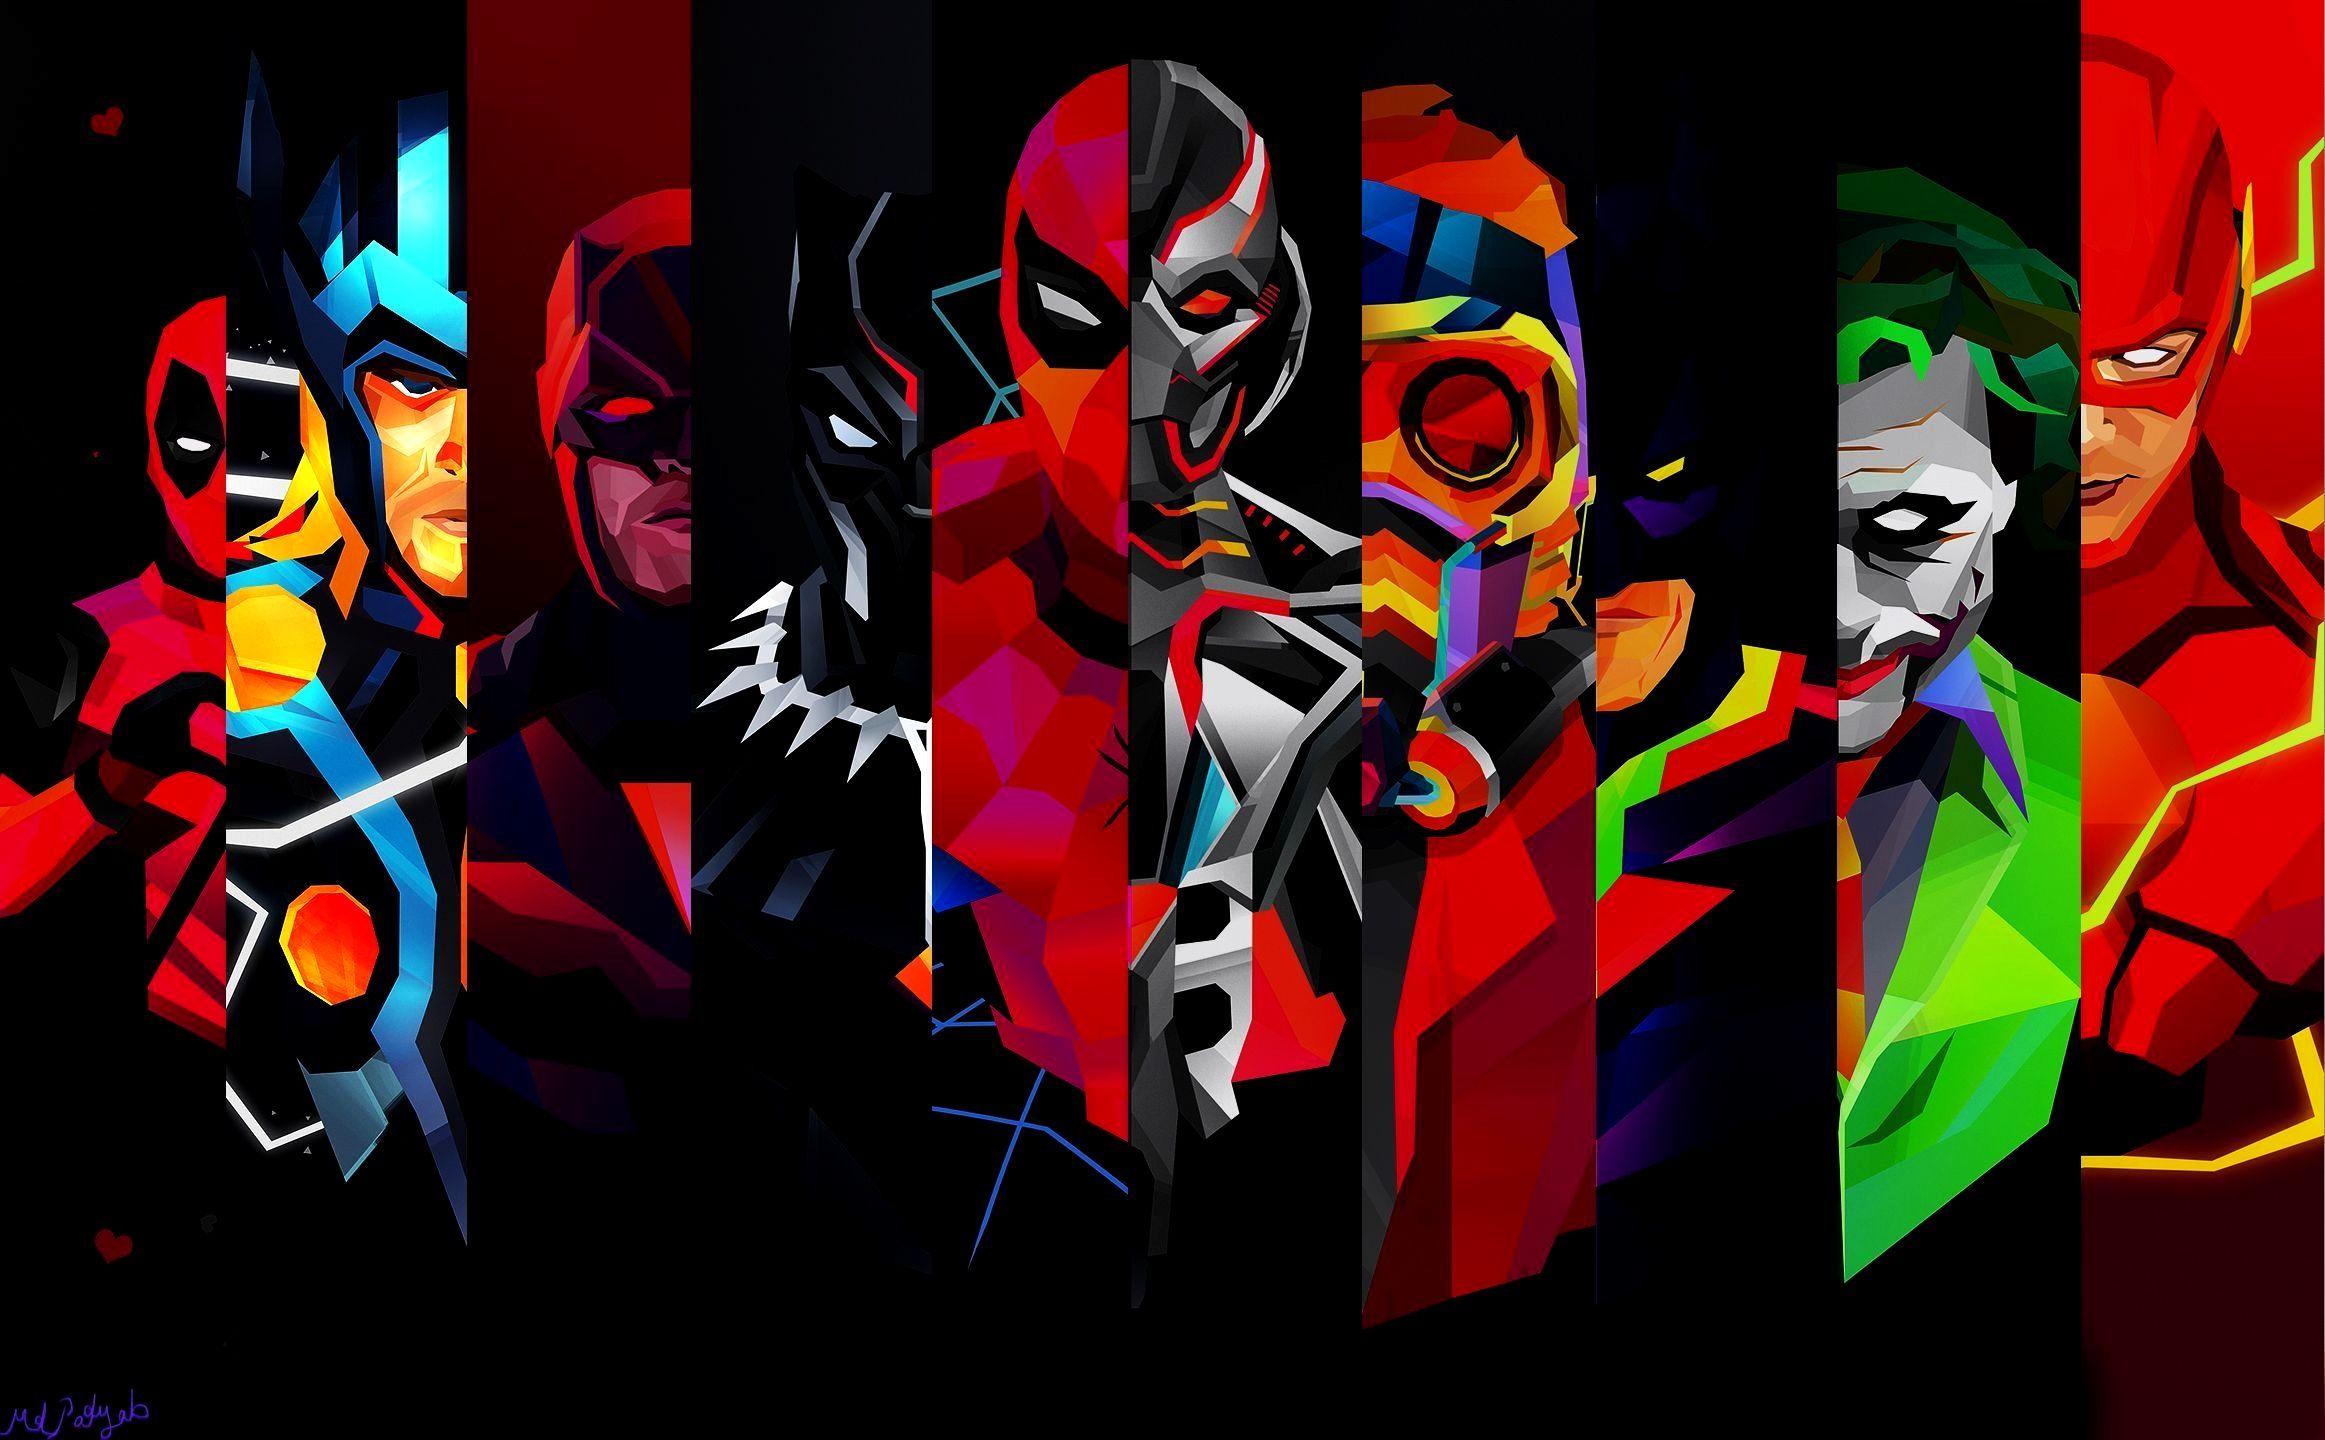 Marvel Wallpaper 4k For Mobile Download Trick Fond D Ecran Deadpool Fond D Ecran Pc Fond D Ecran Pour Ordinateur